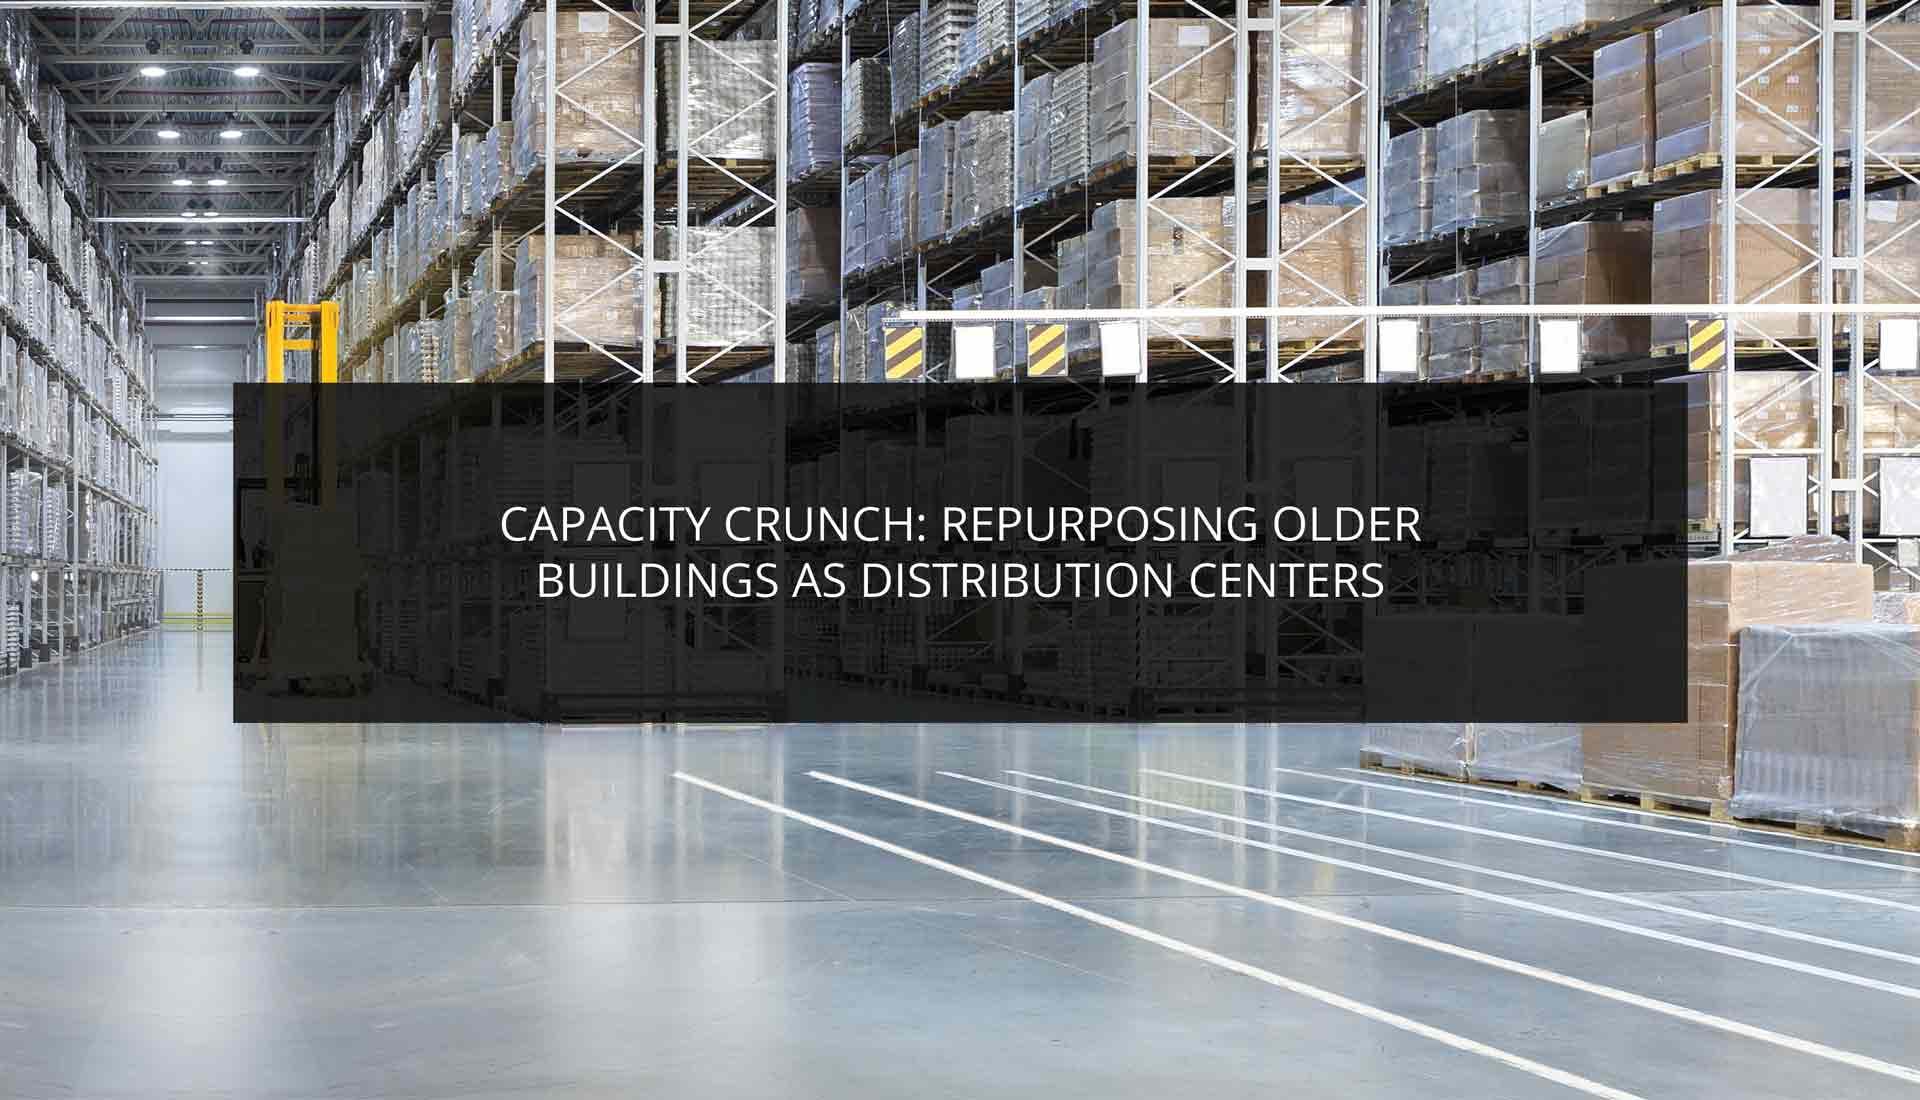 Capacity Crunch: Repurposing Older Buildings as Distribution Centers